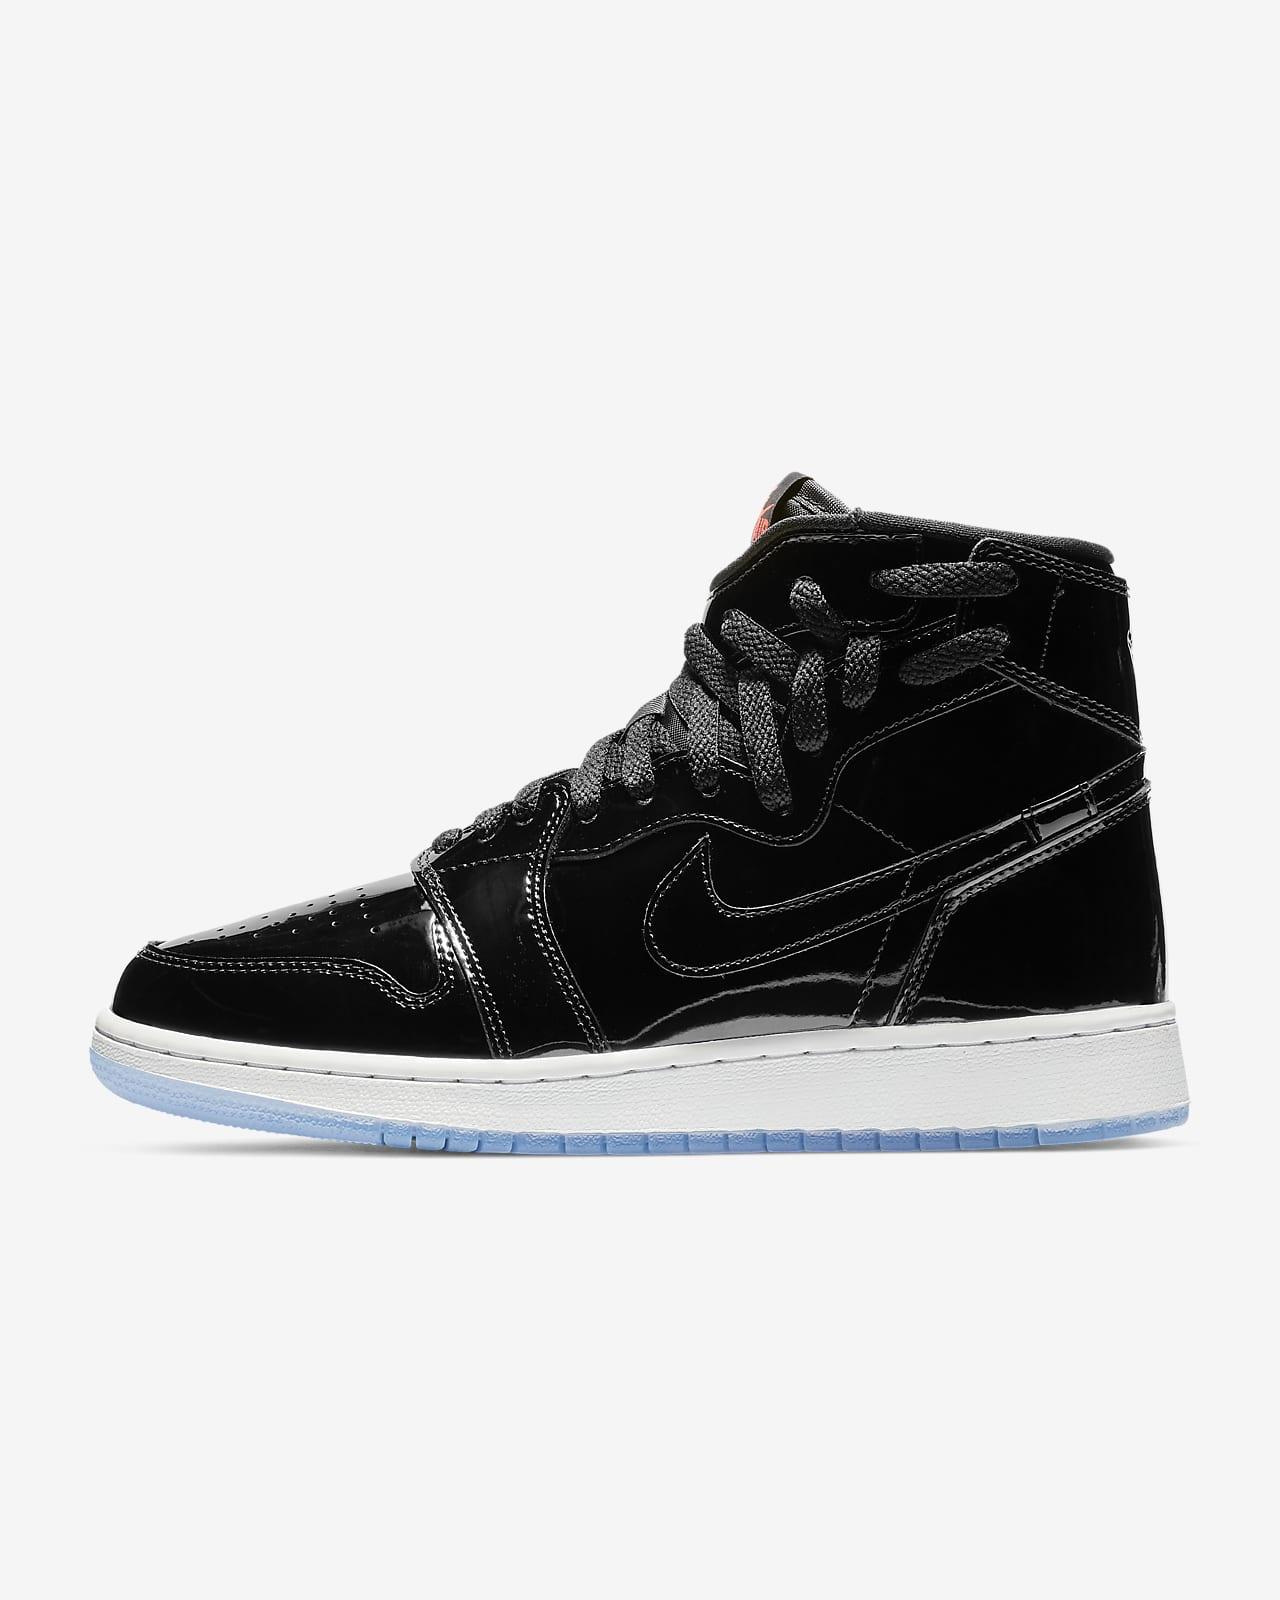 Air Jordan 1 Rebel XX Women's Shoe